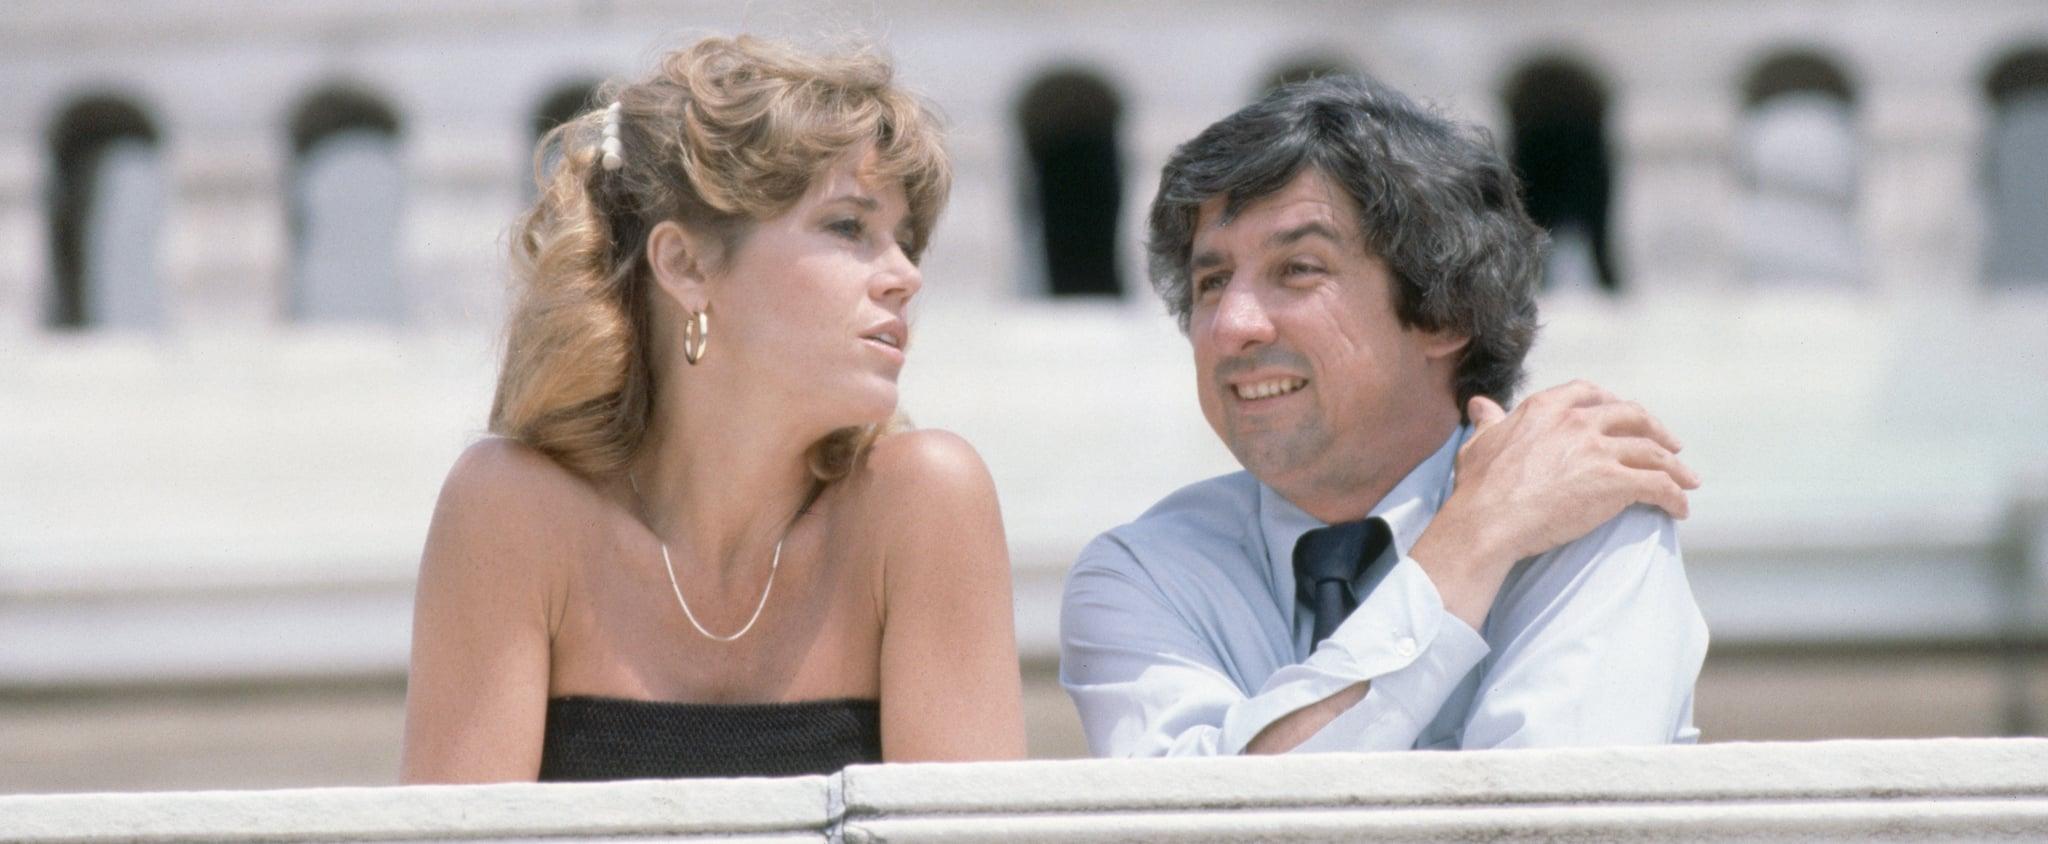 How Long Were Tom Hayden and Jane Fonda Married?